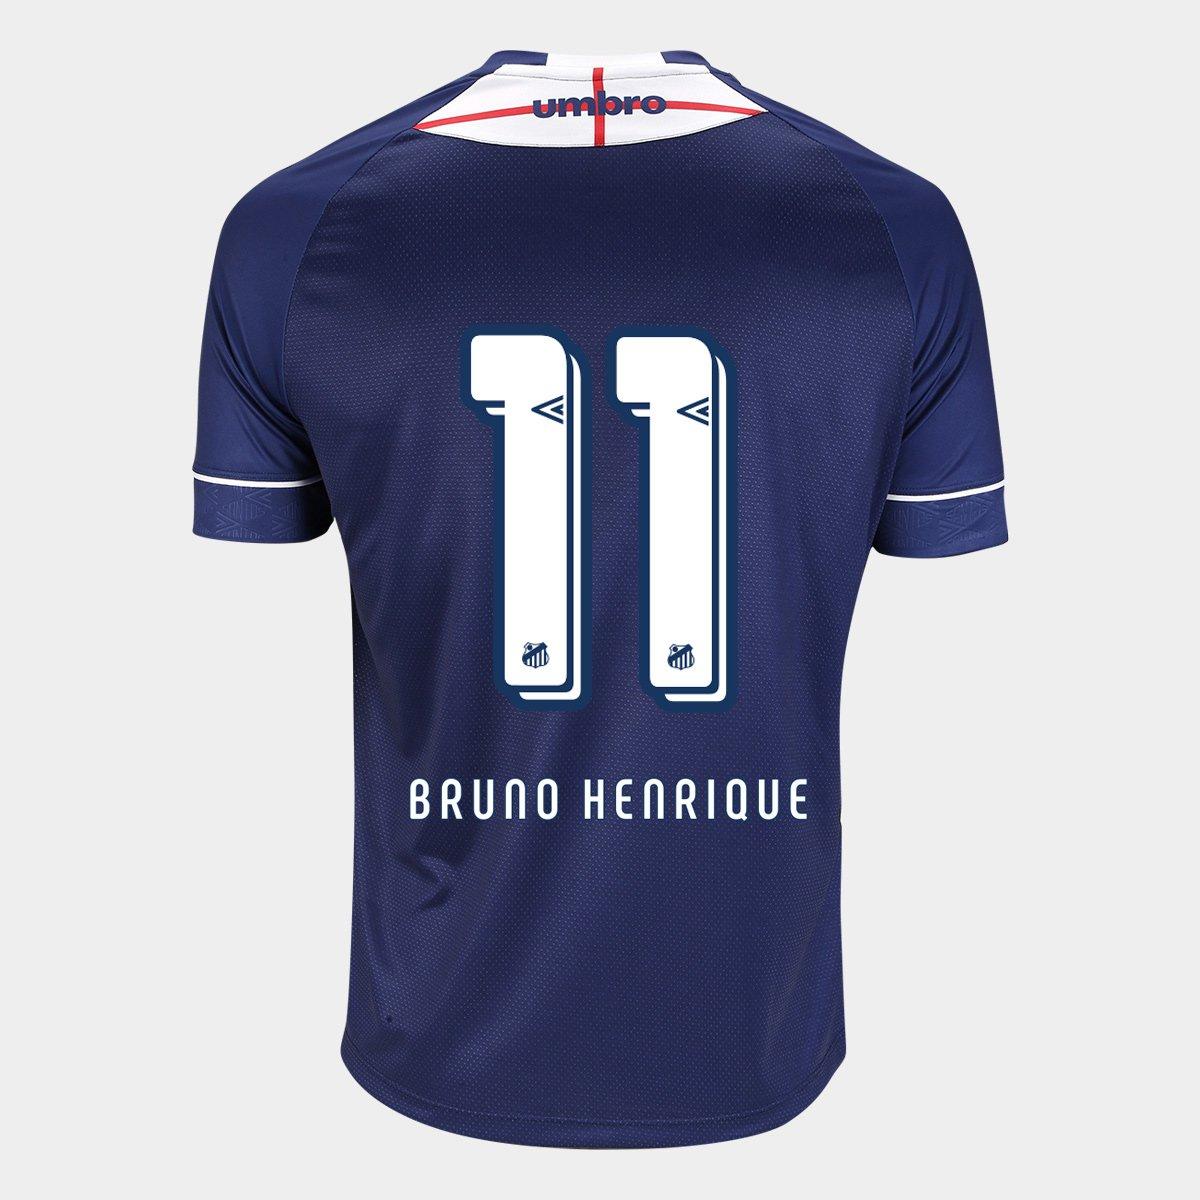 d6535ebebc Camisa Santos 2018 The Kingdom n° 11 Bruno Henrique - Torcedor Umbro  Masculina - Compre Agora